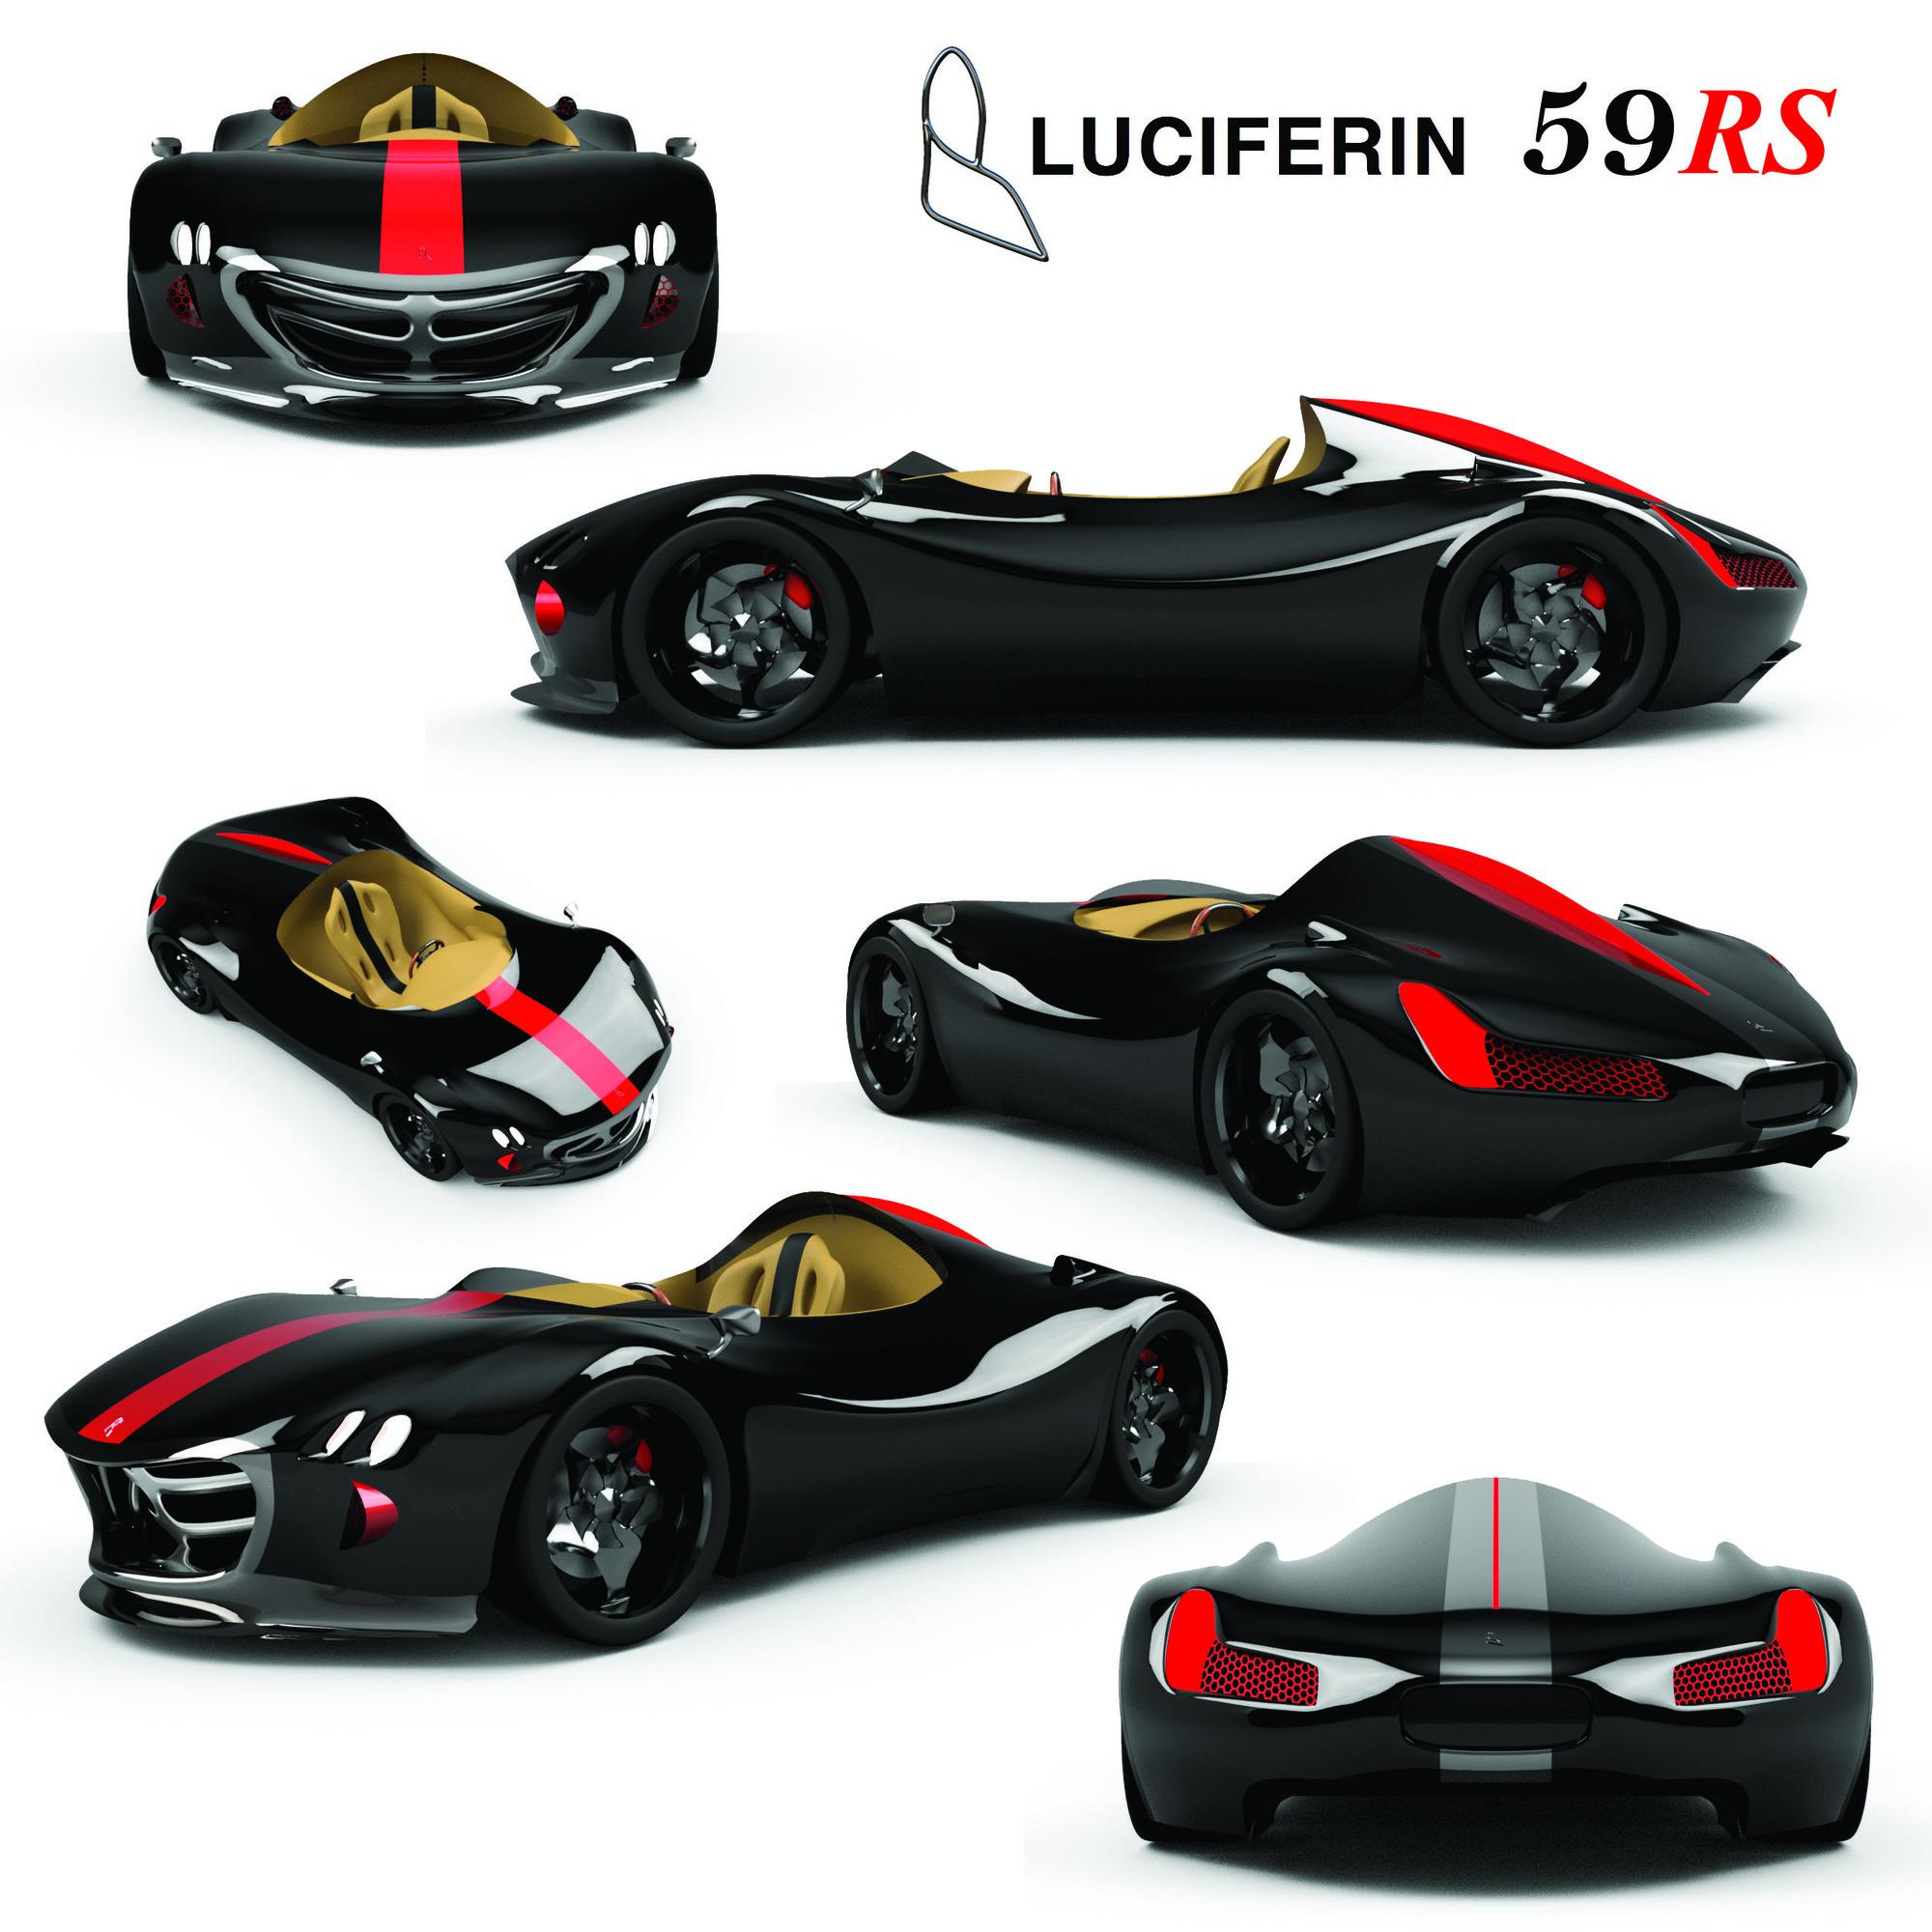 Luciferin_59rs